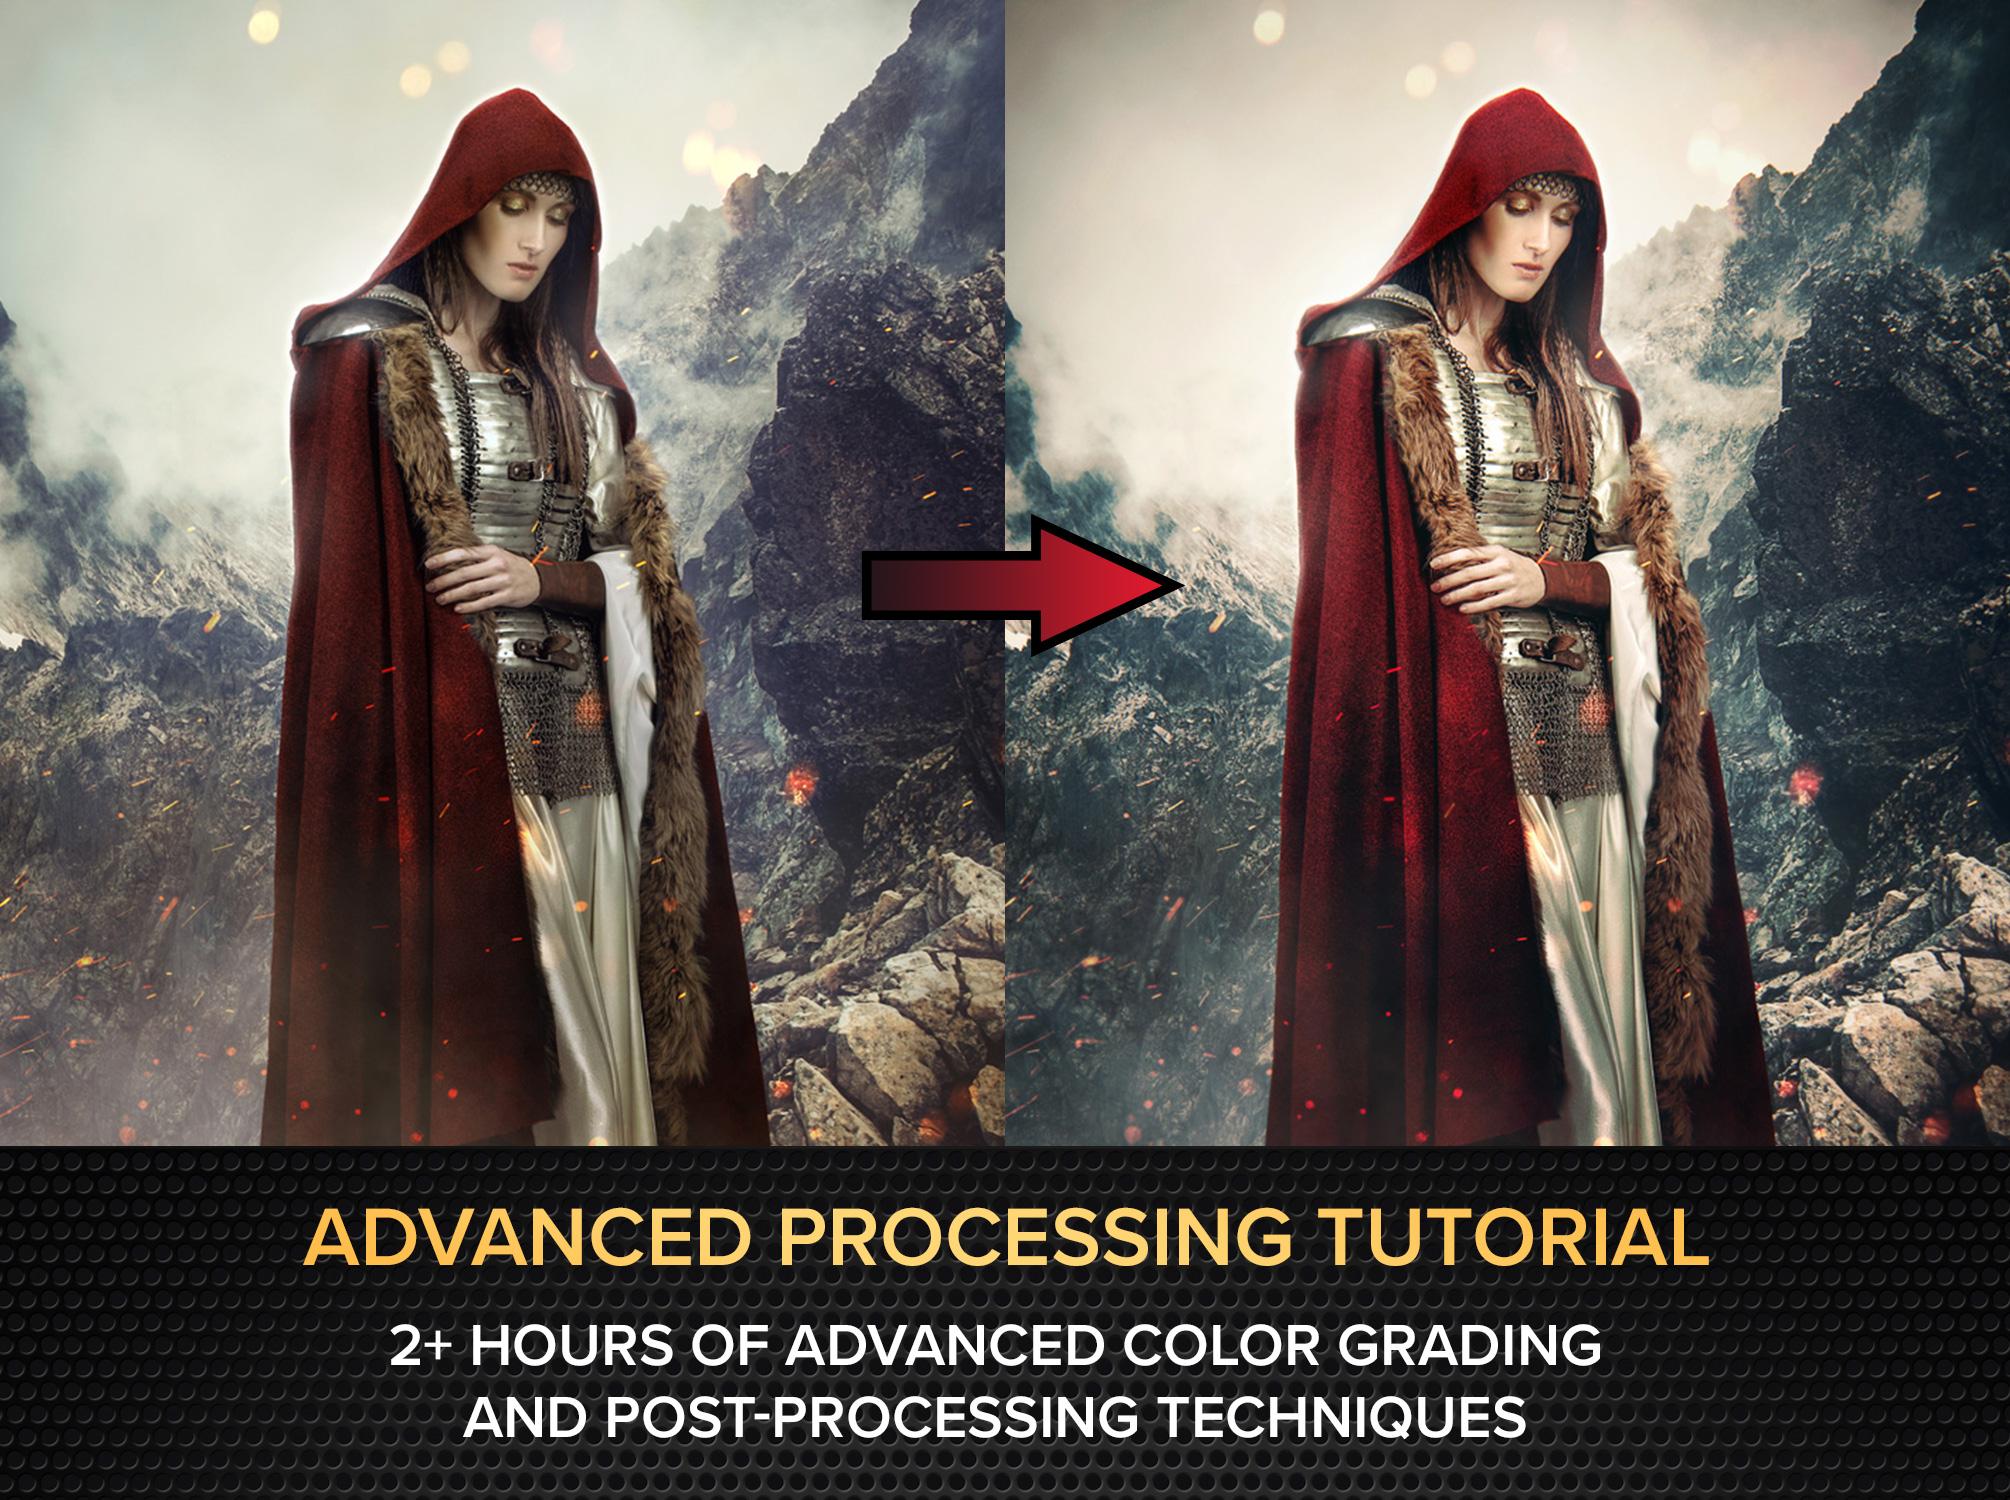 Advanced-Processing-Tutorial_Gumroad.jpg